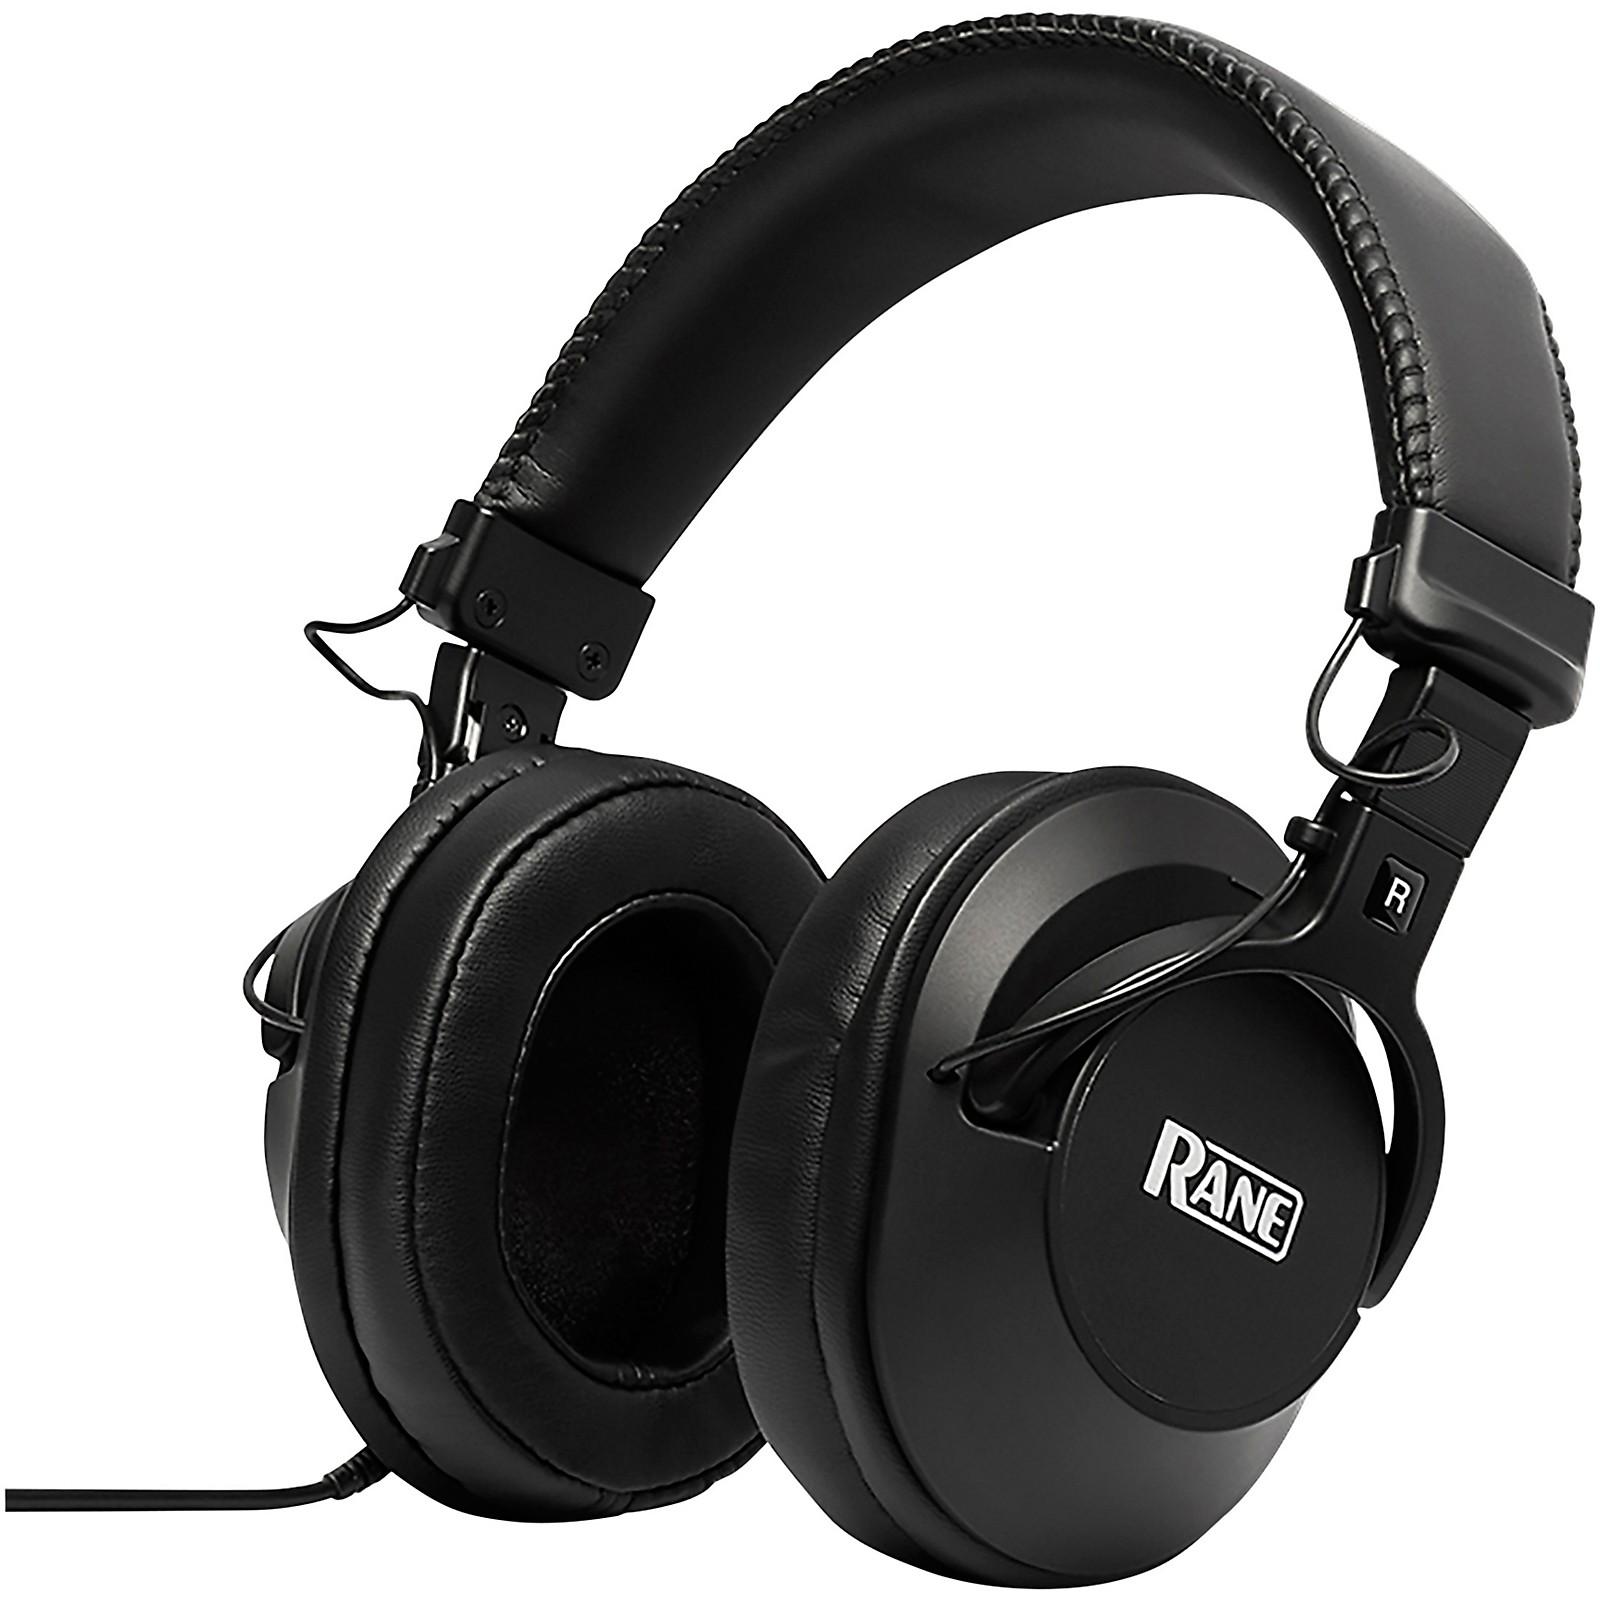 Rane RH-50 Studio Monitoring Headphones